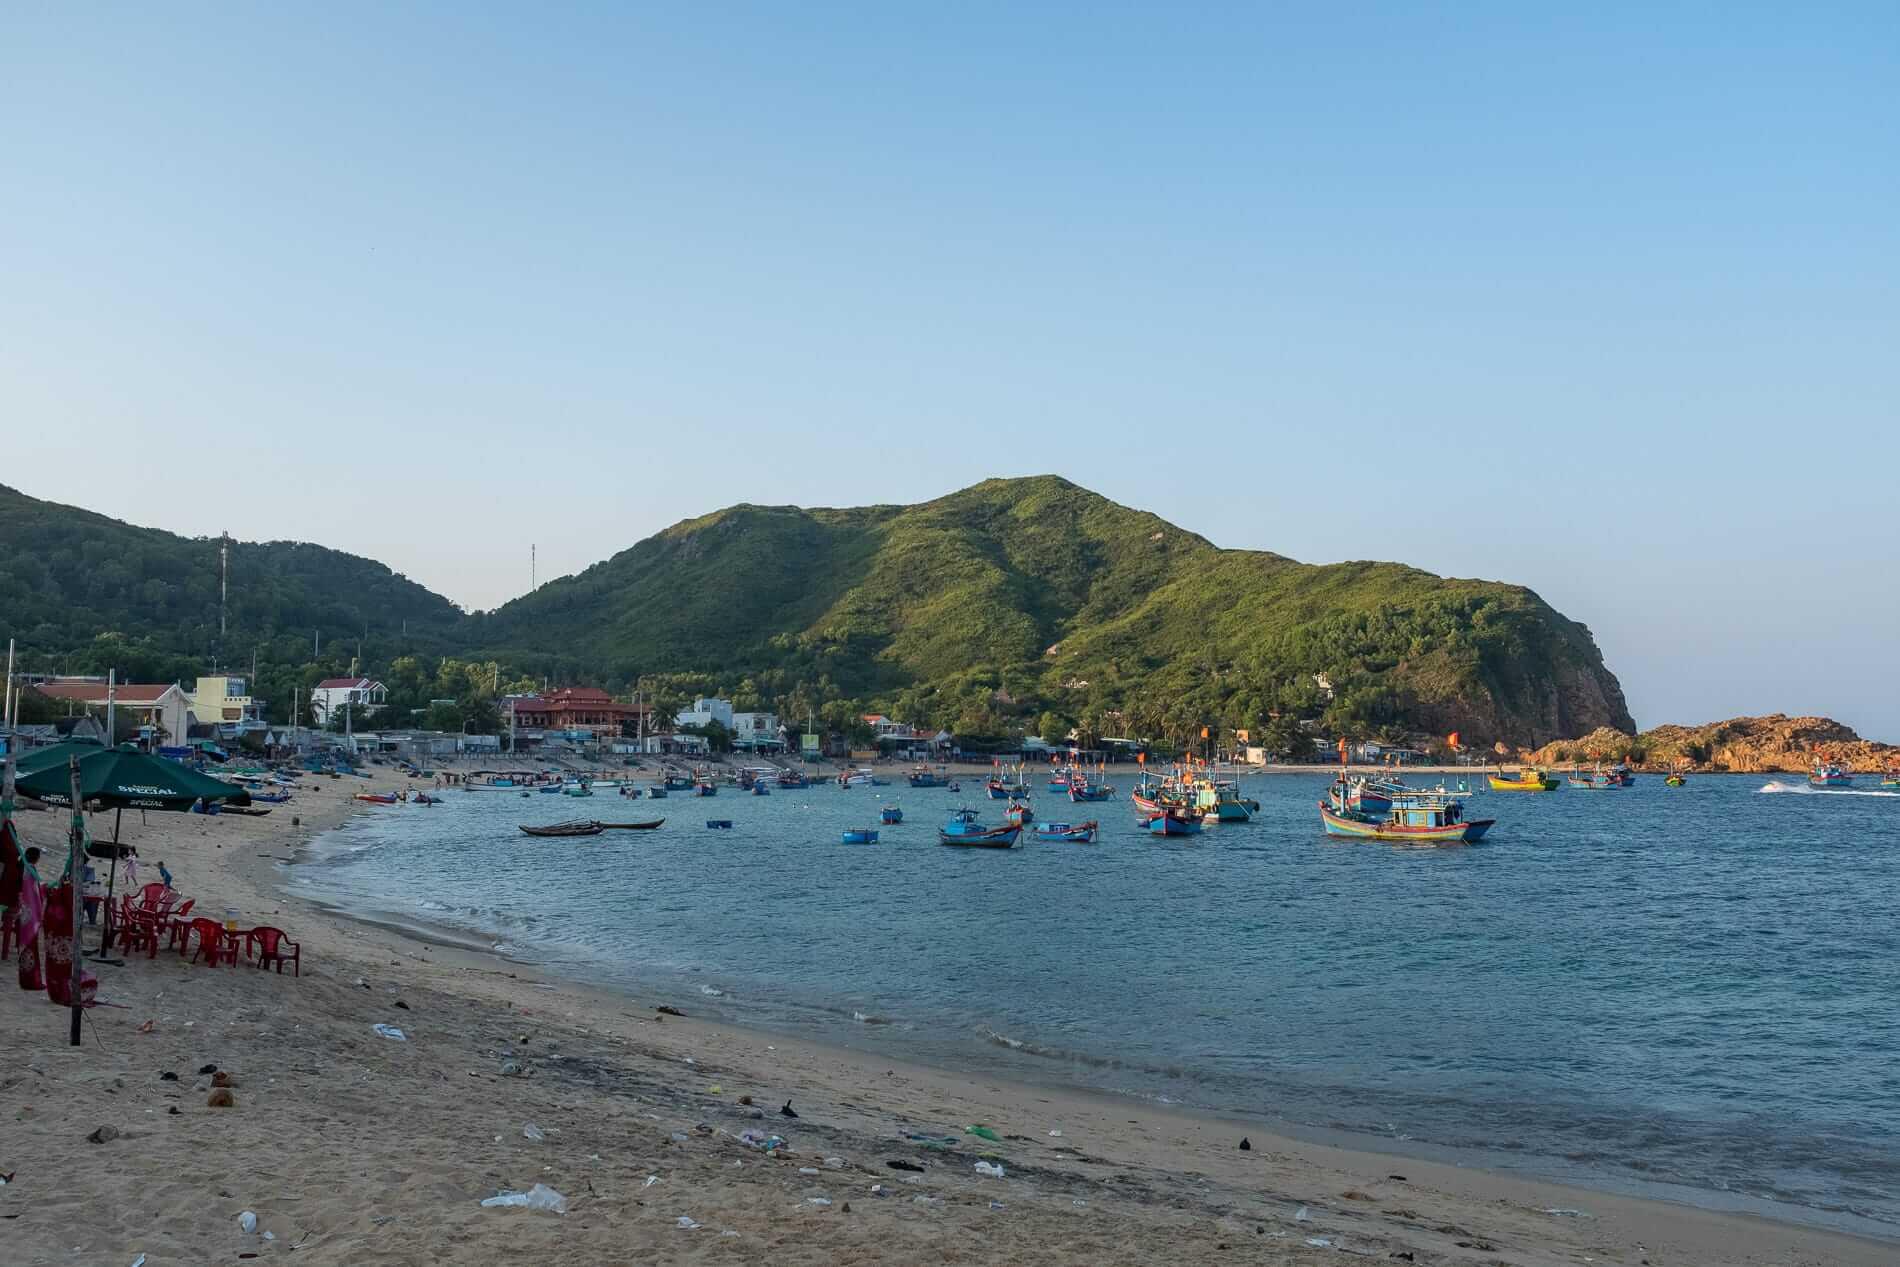 Bai Xep fishing village - Hoi An to Quy Nhon